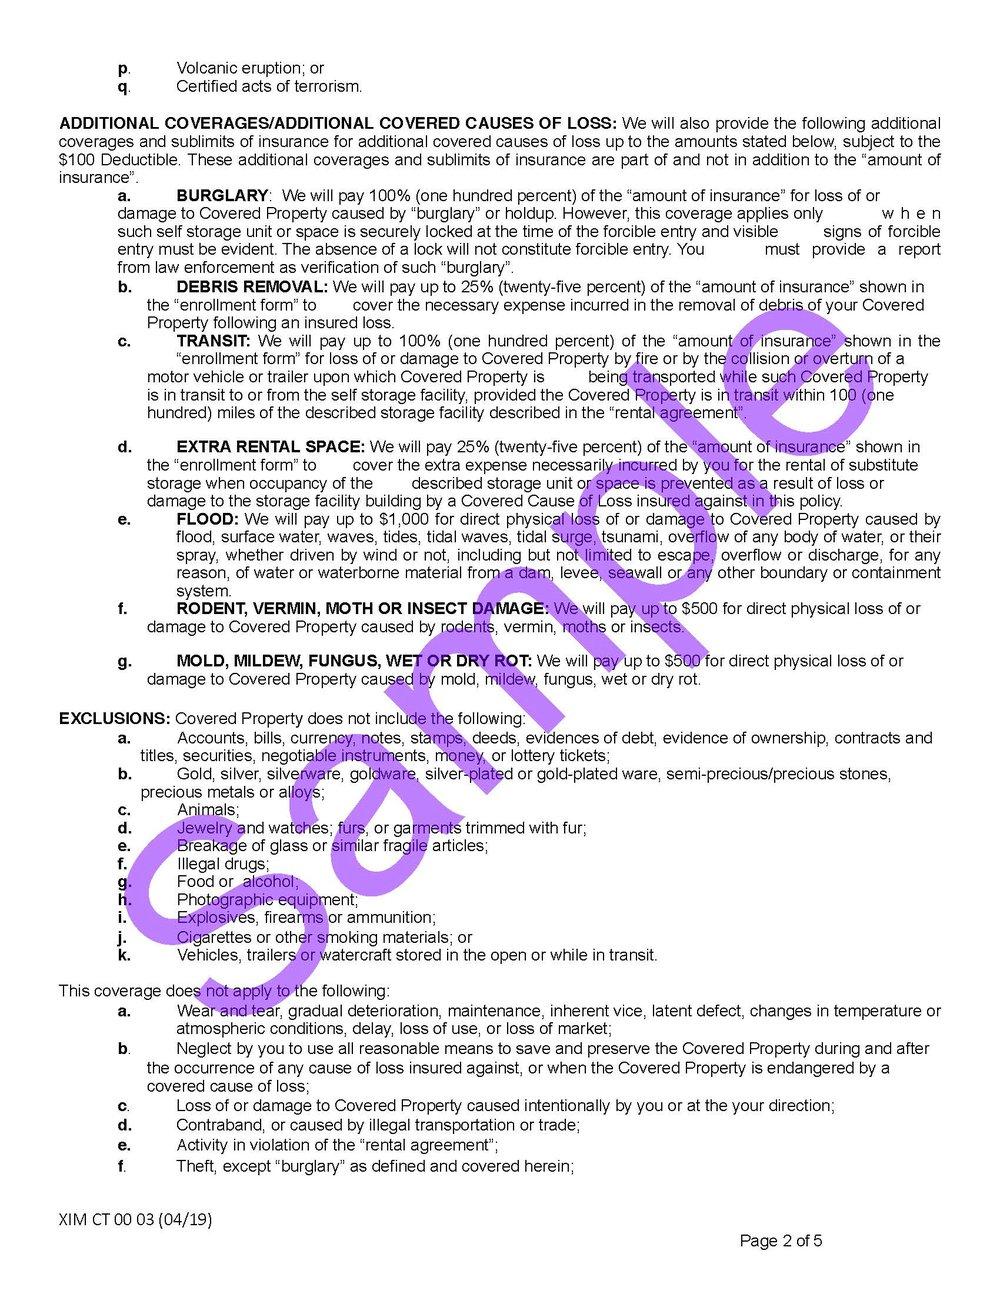 XIM CT 00 03 04 19 Connecticut Certificate of InsuranceSample_Page_2.jpg